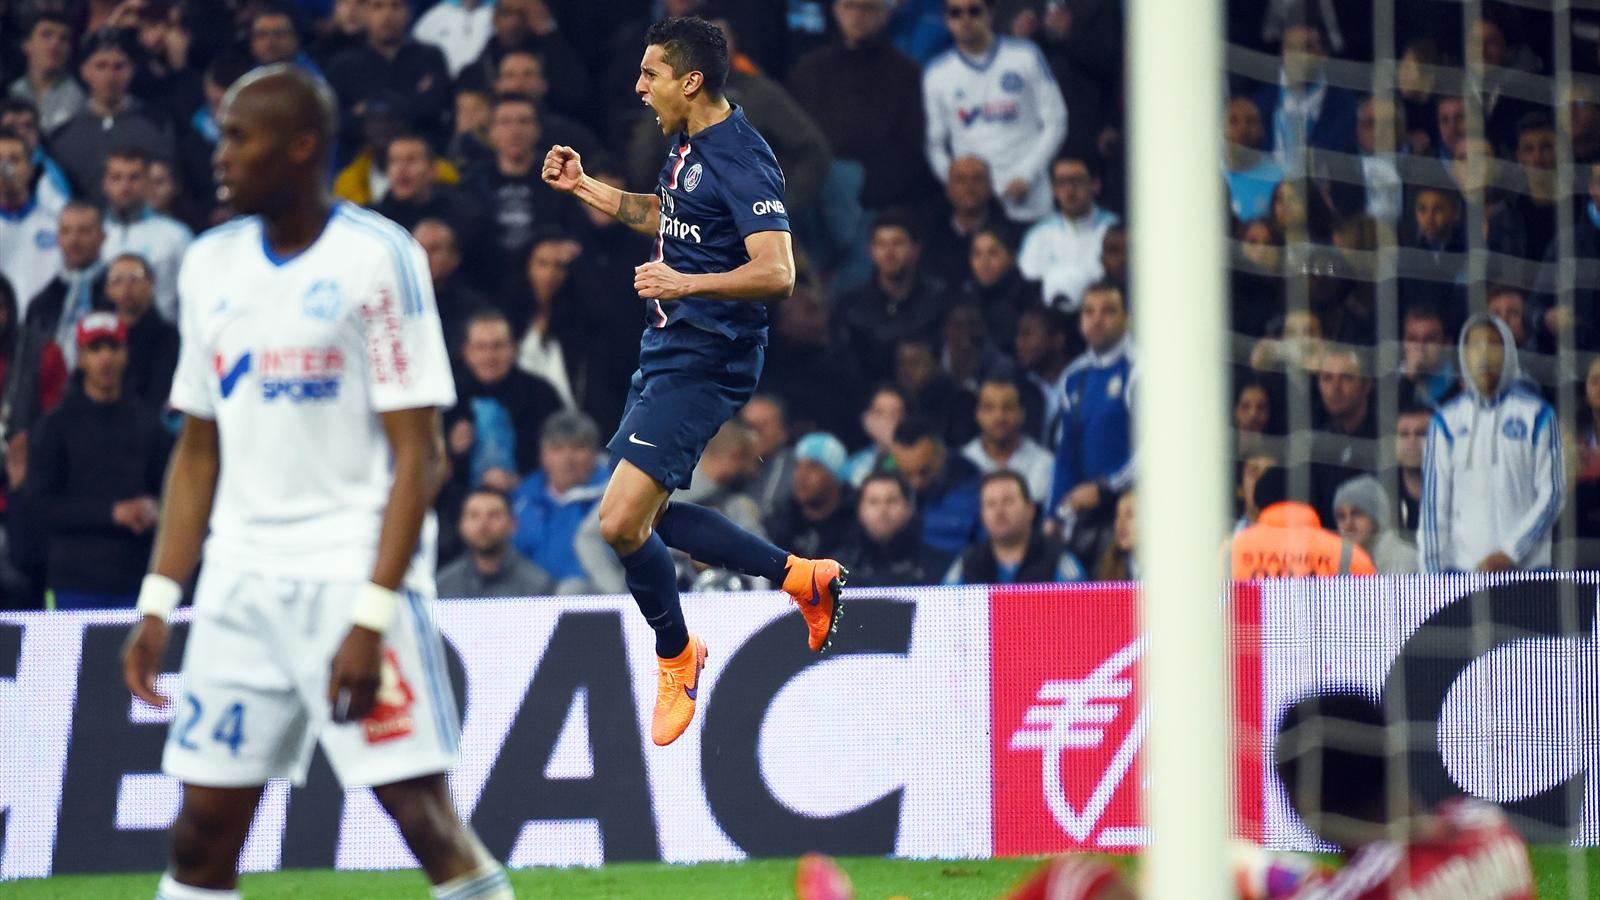 Video: Olympique Marseille vs PSG